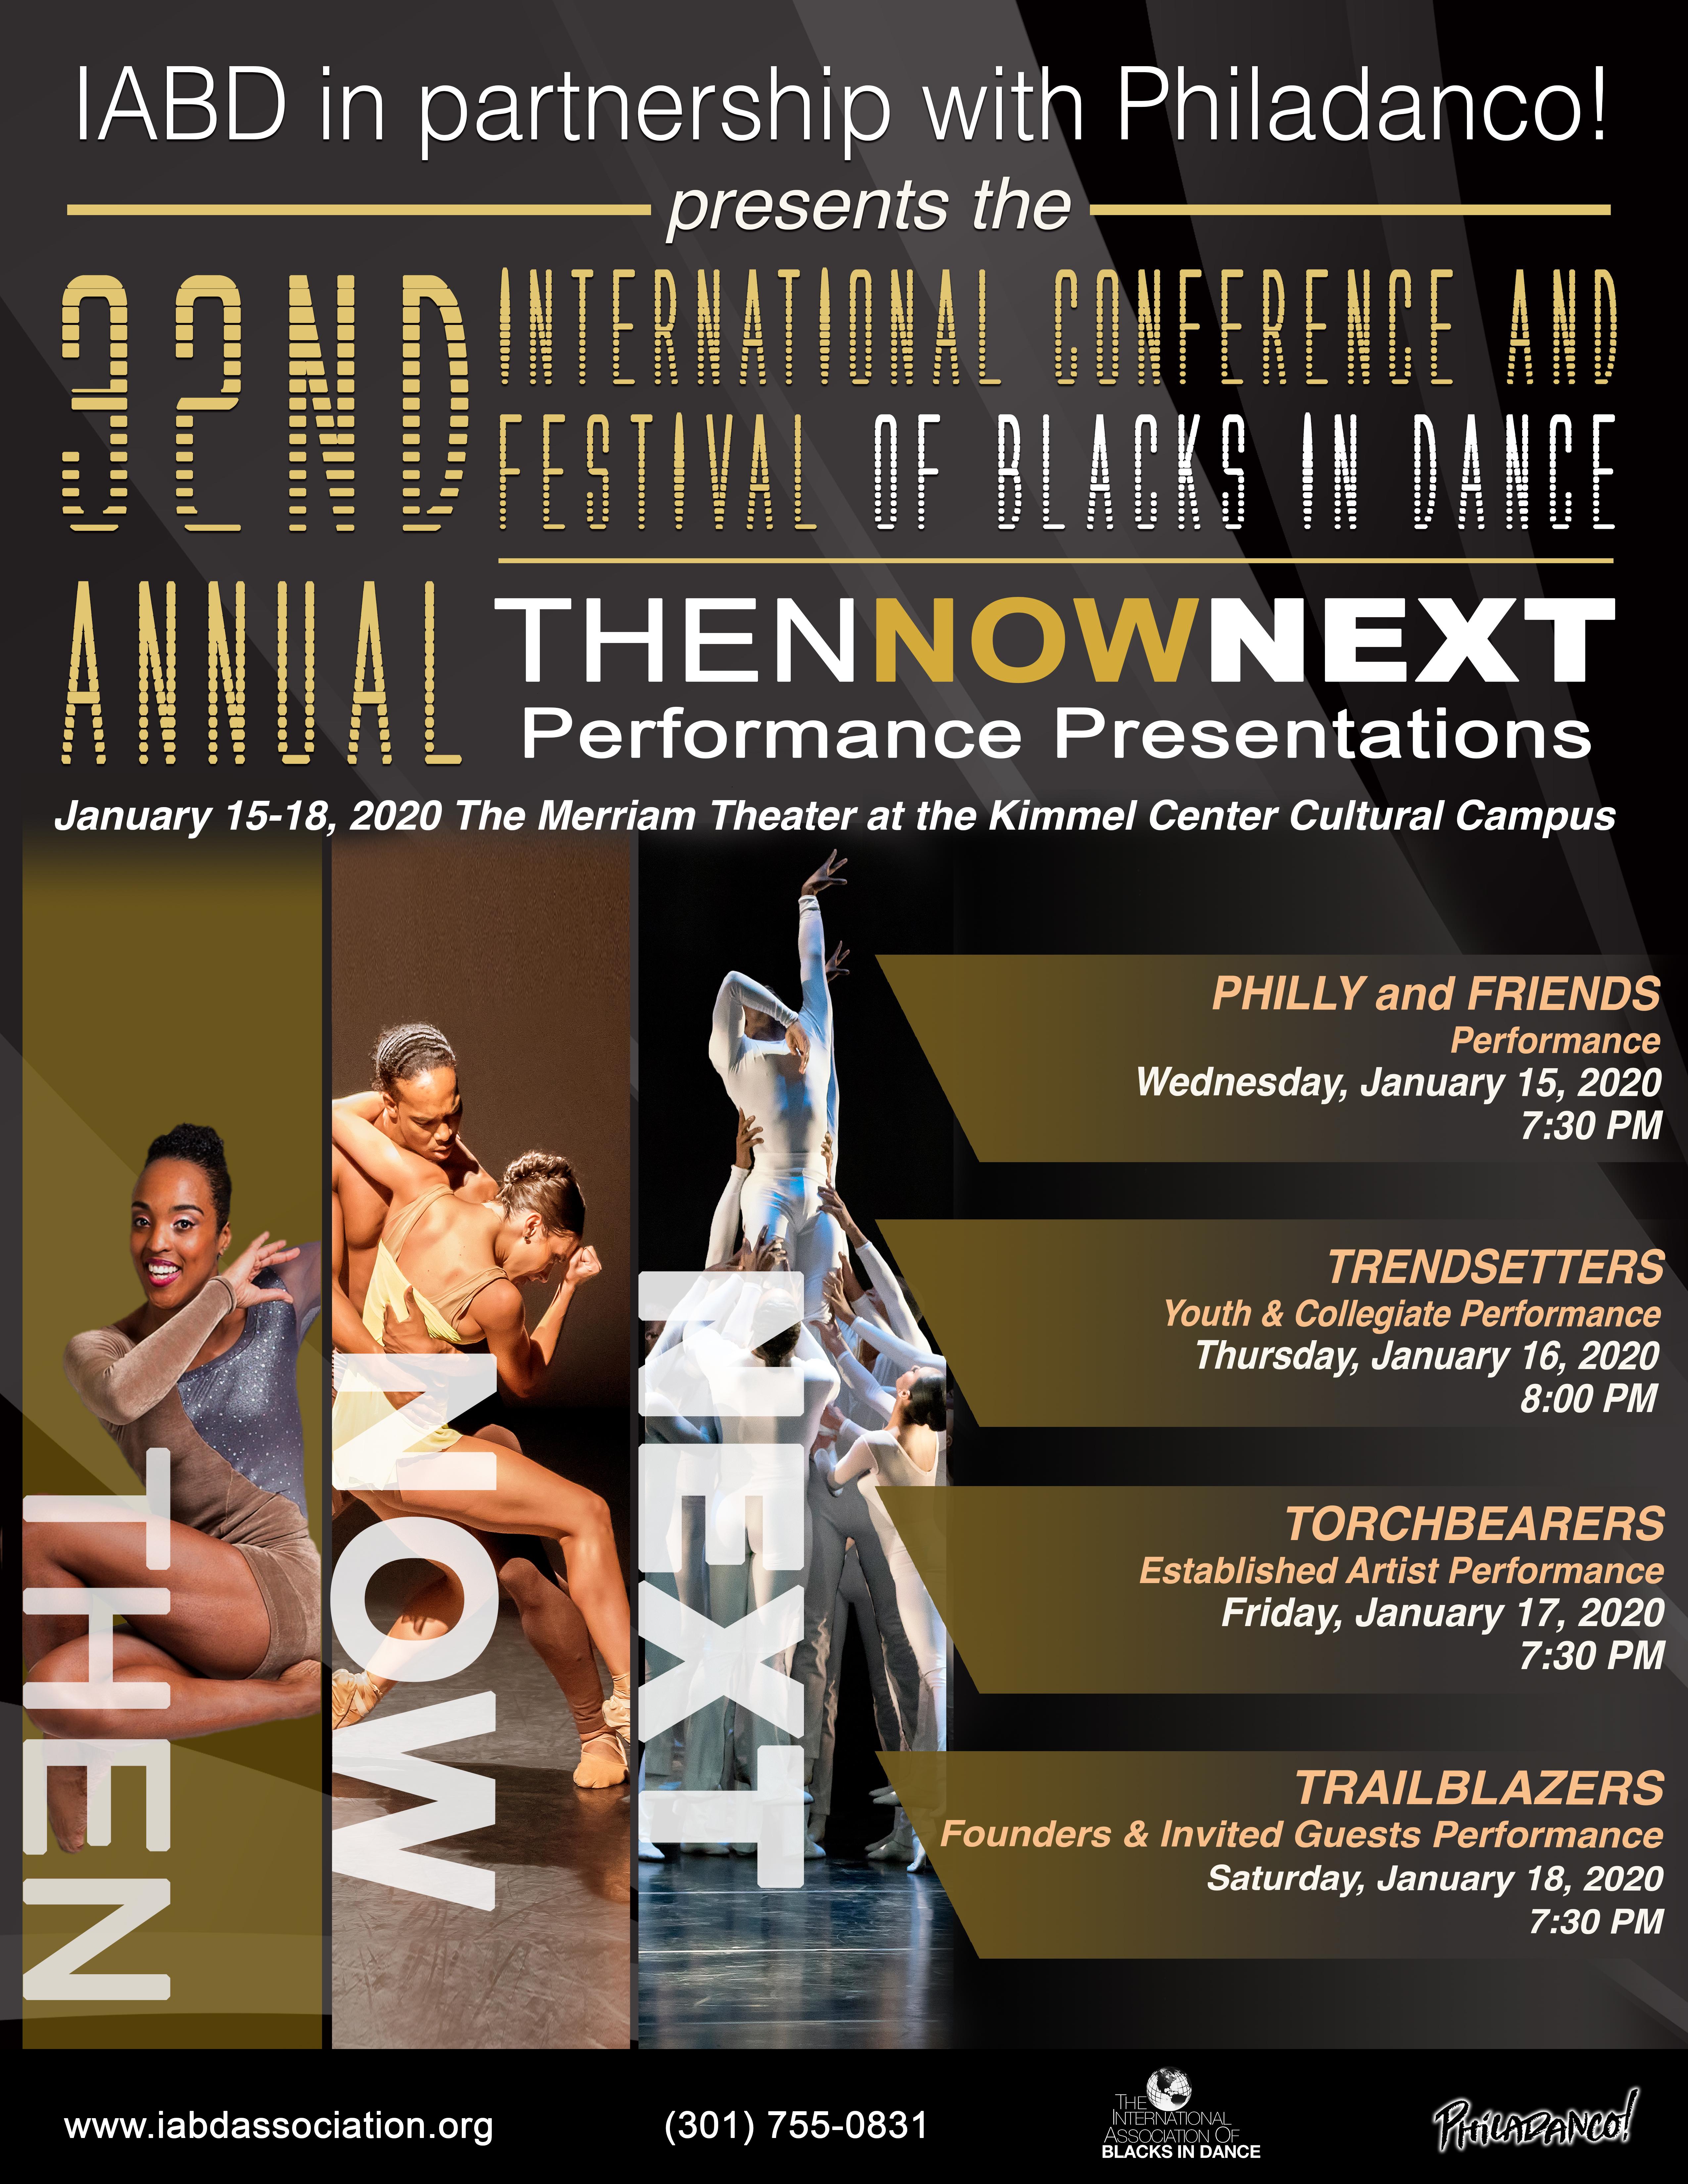 2020 Performance Presentations